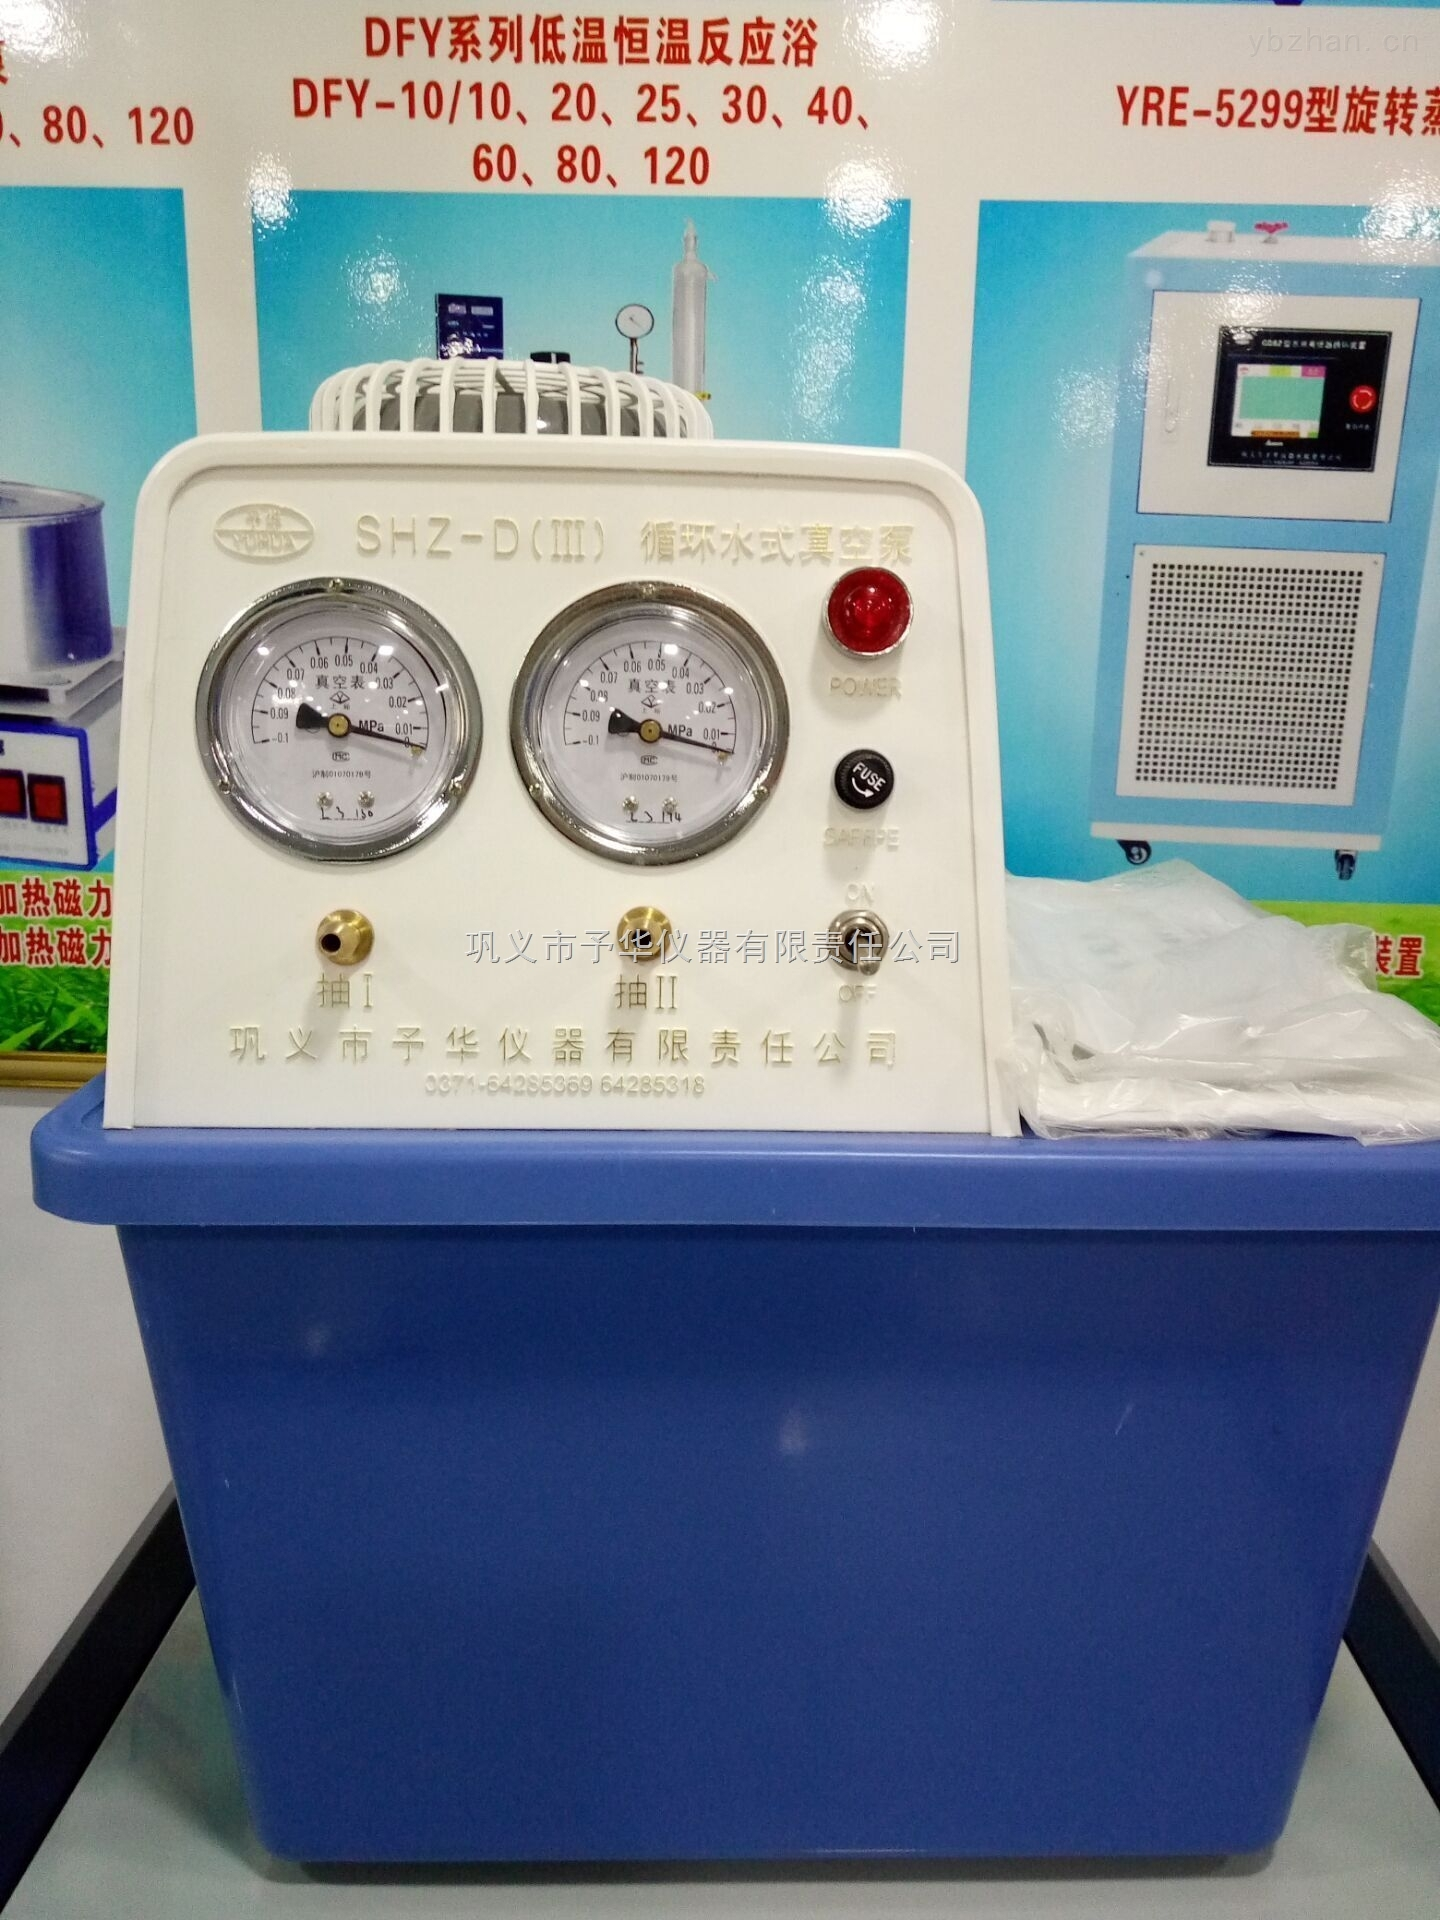 SHZ-D(III)-不锈钢双表双抽循环水多用真空泵